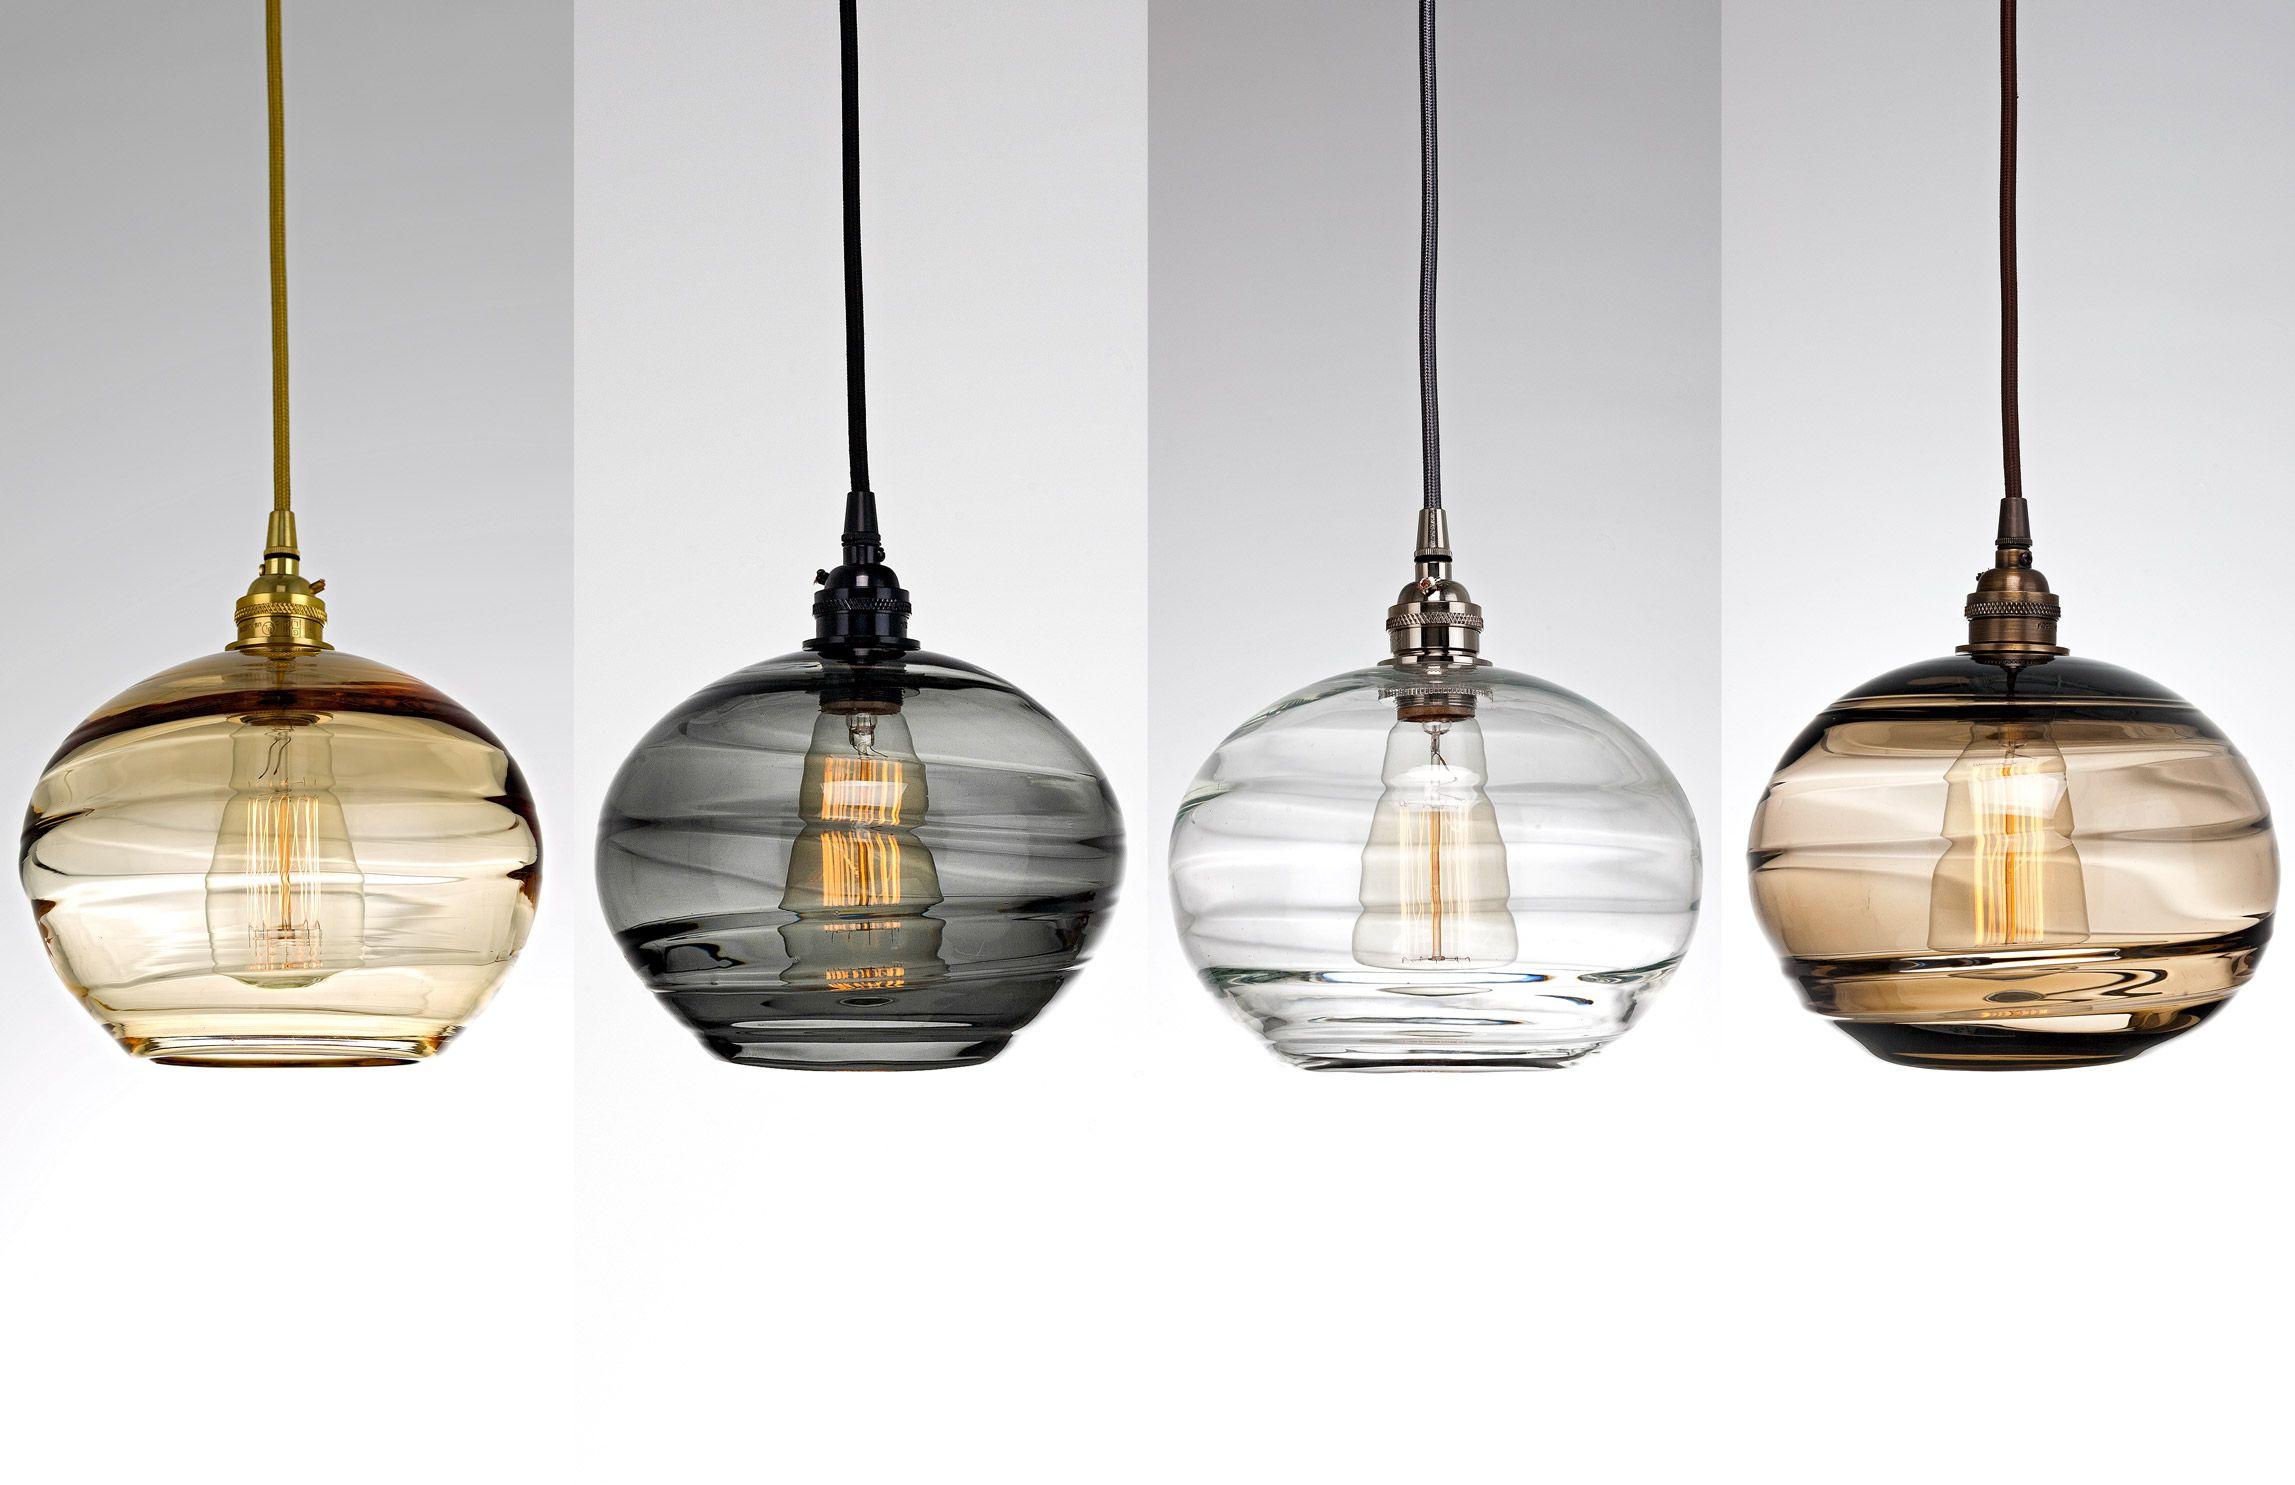 Coppa Hand Blown Glass Lighting By Hammerton Studio Blown Glass Lighting Hand Blown Glass Lighting Glass Pendant Light